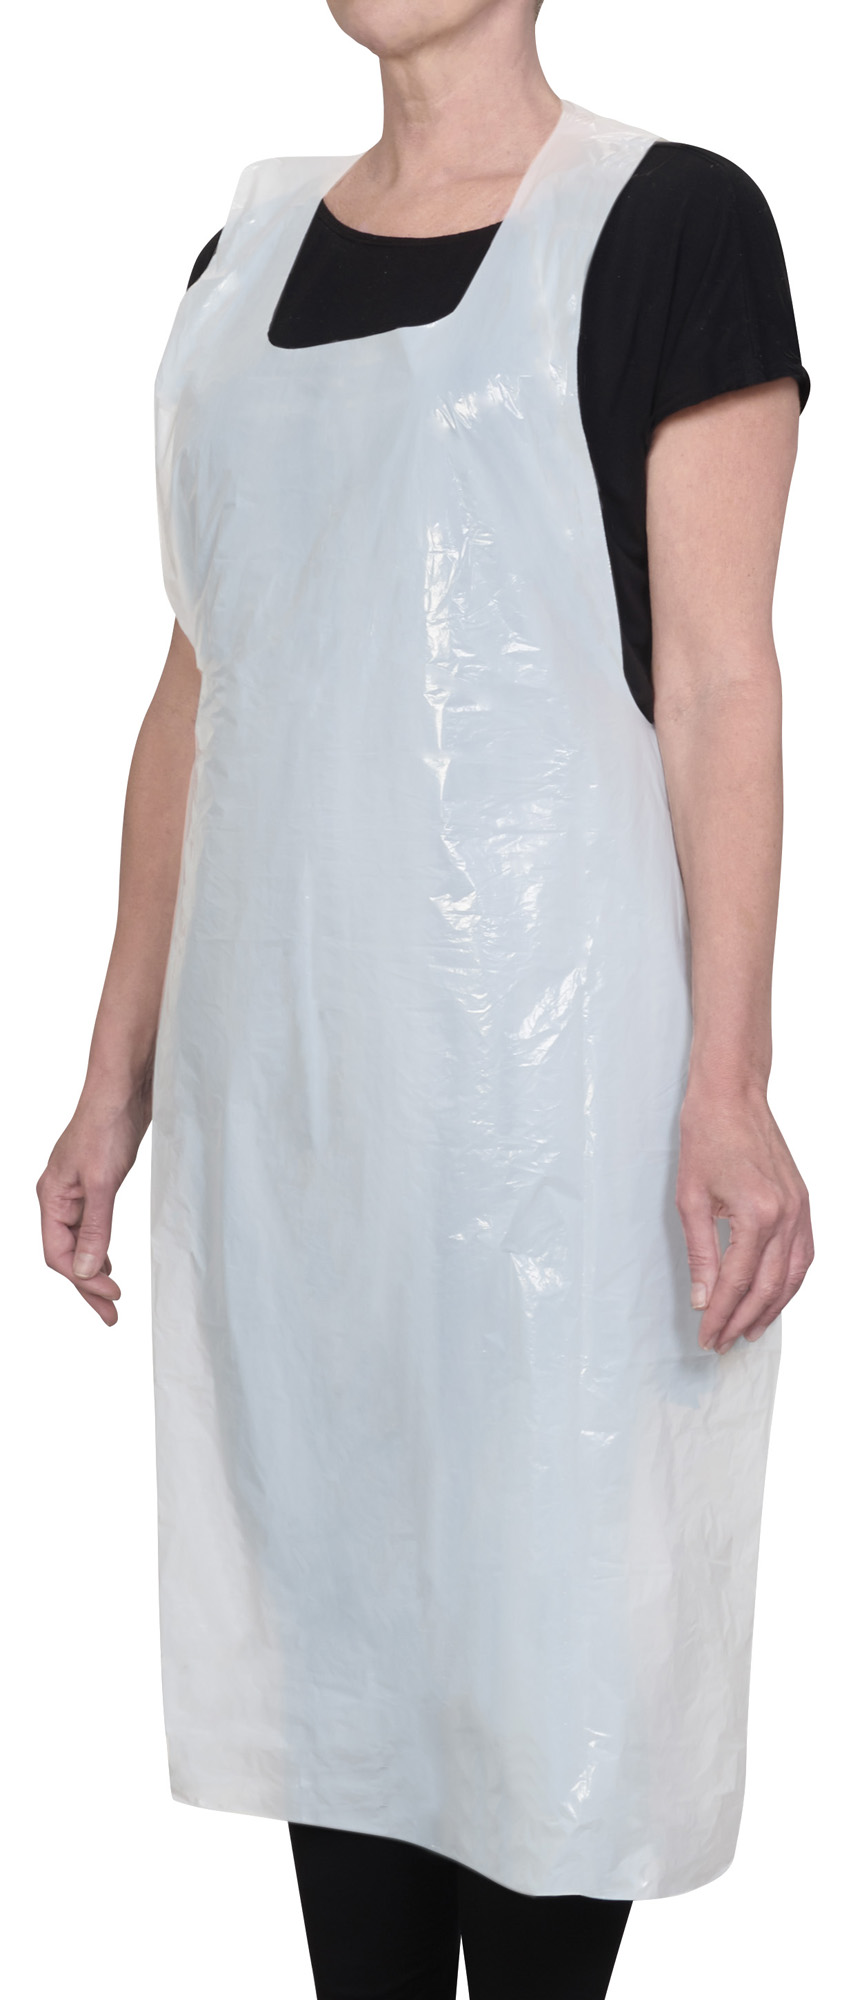 Winco BADP-2846 plastic apron